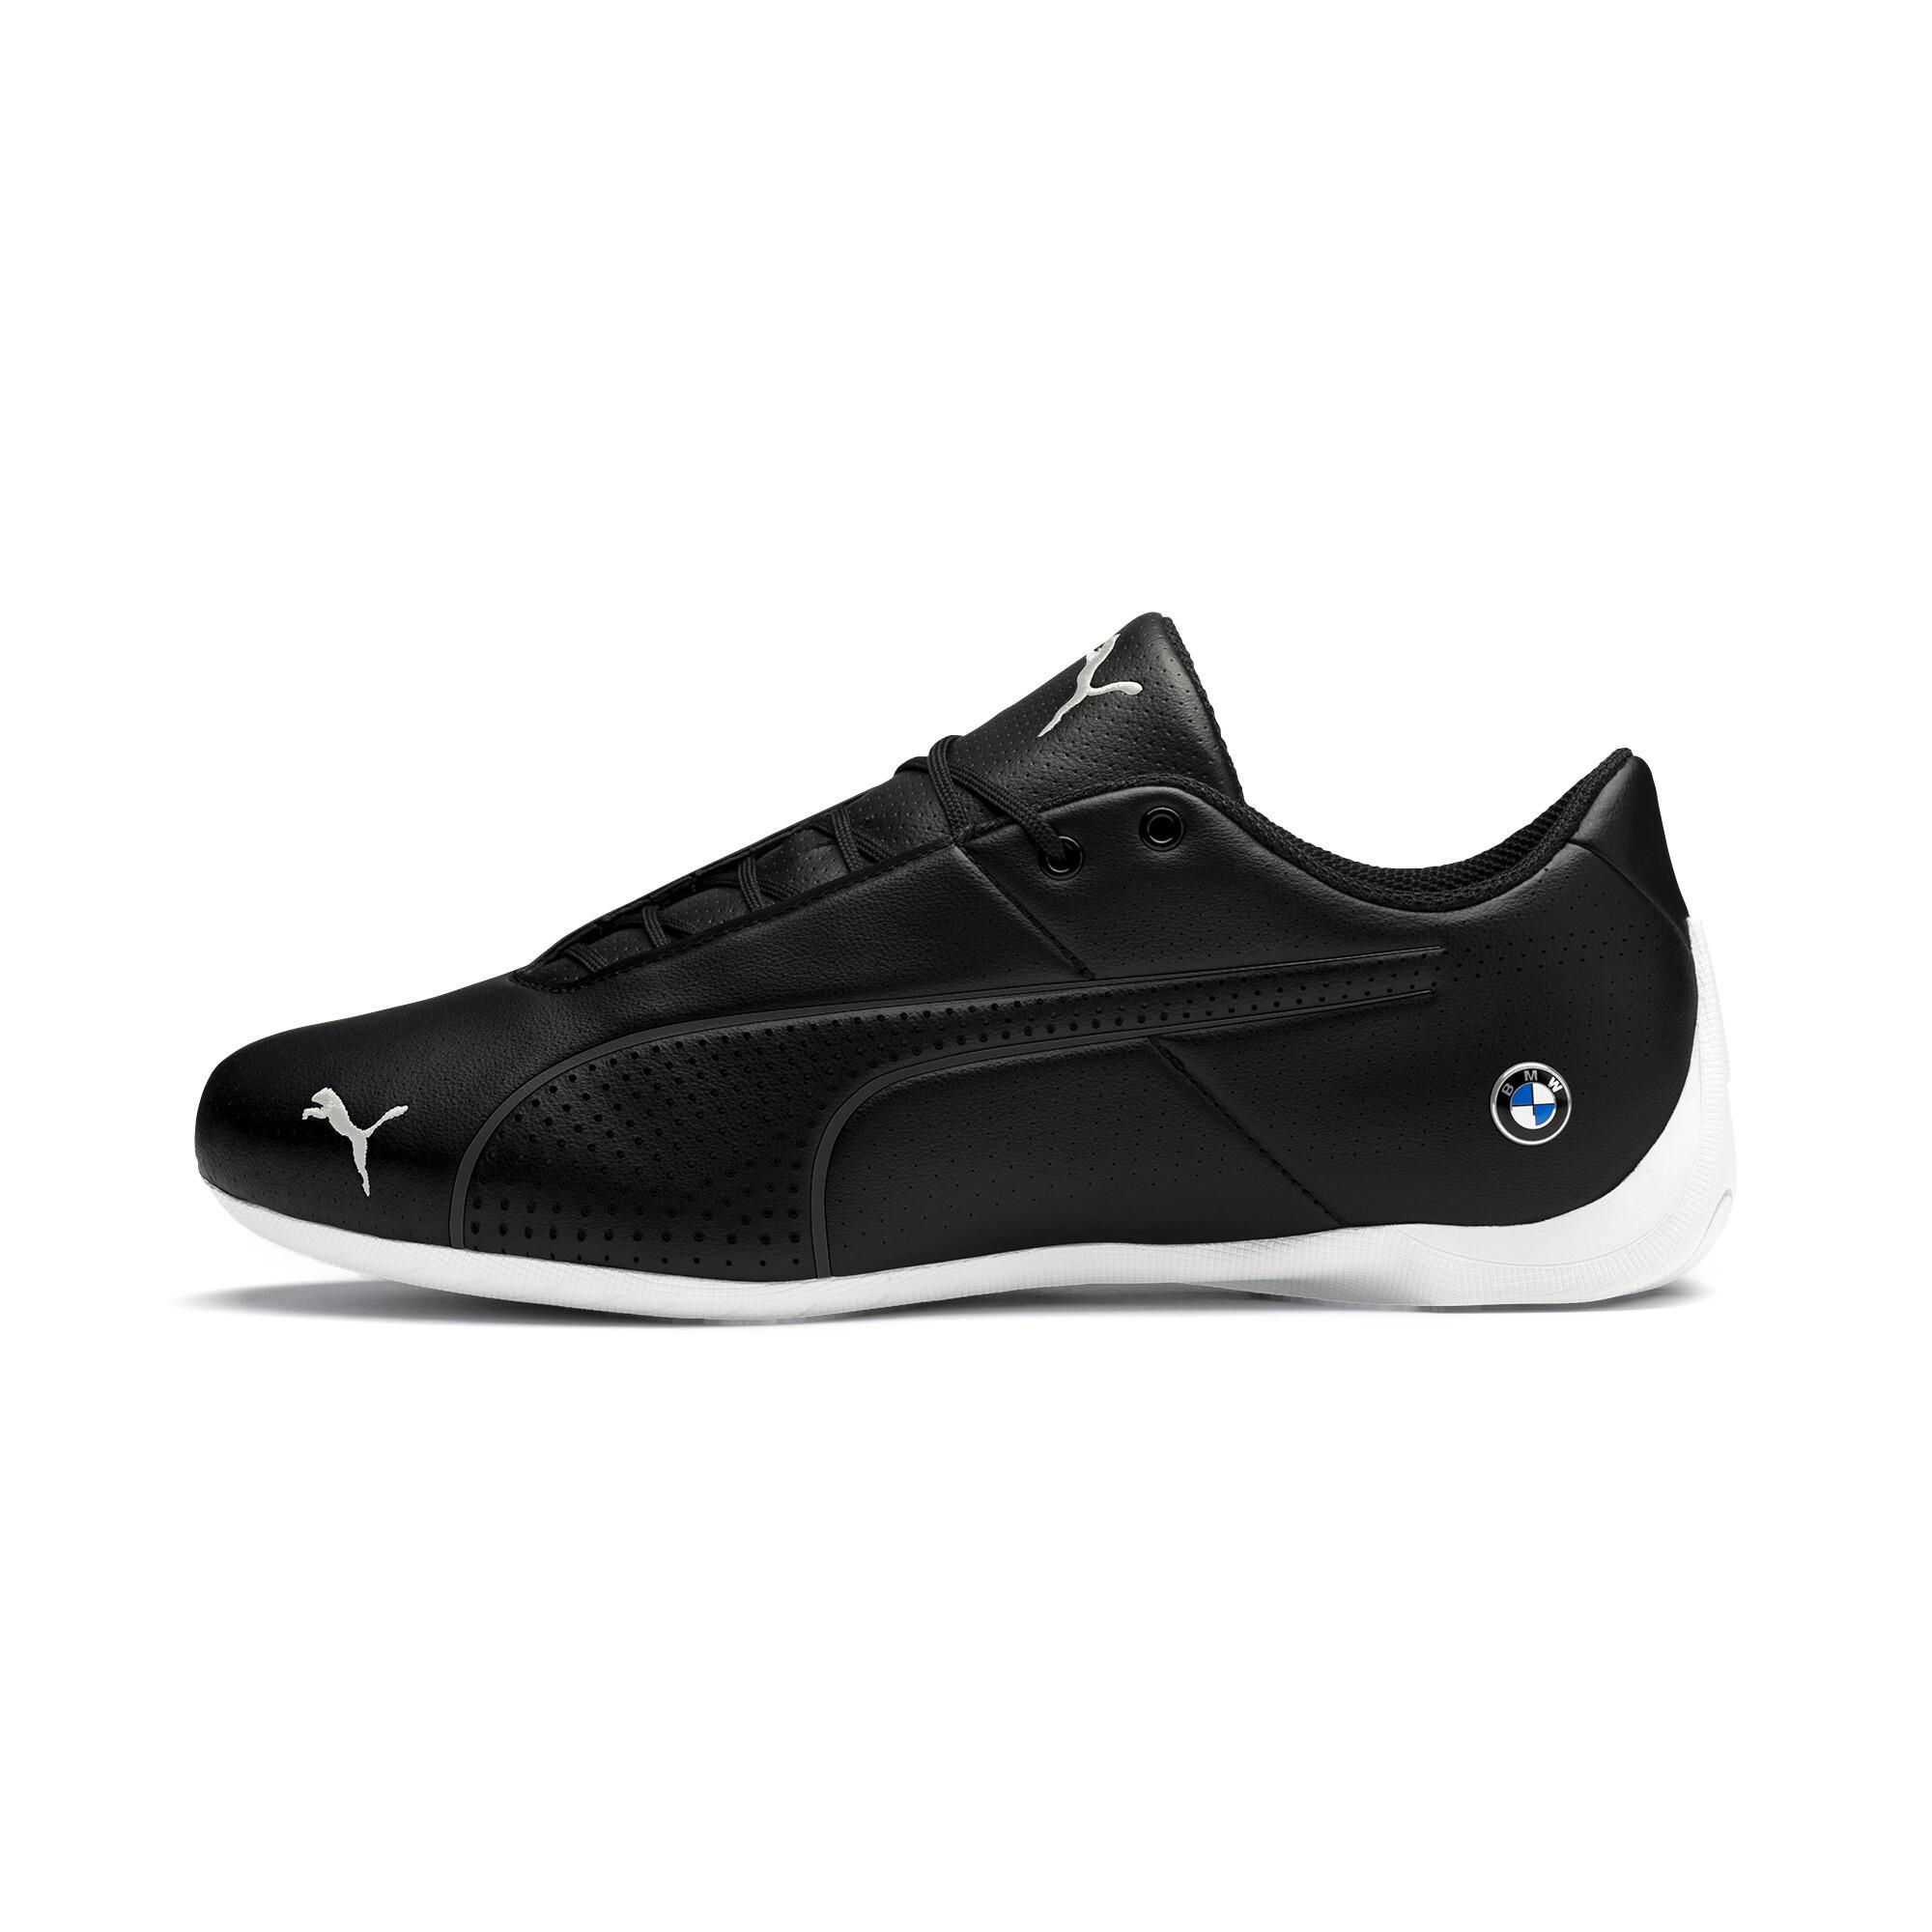 Indexbild 14 - PUMA BMW M Motorsport Future Cat Ultra Sneaker Unisex Schuhe Neu